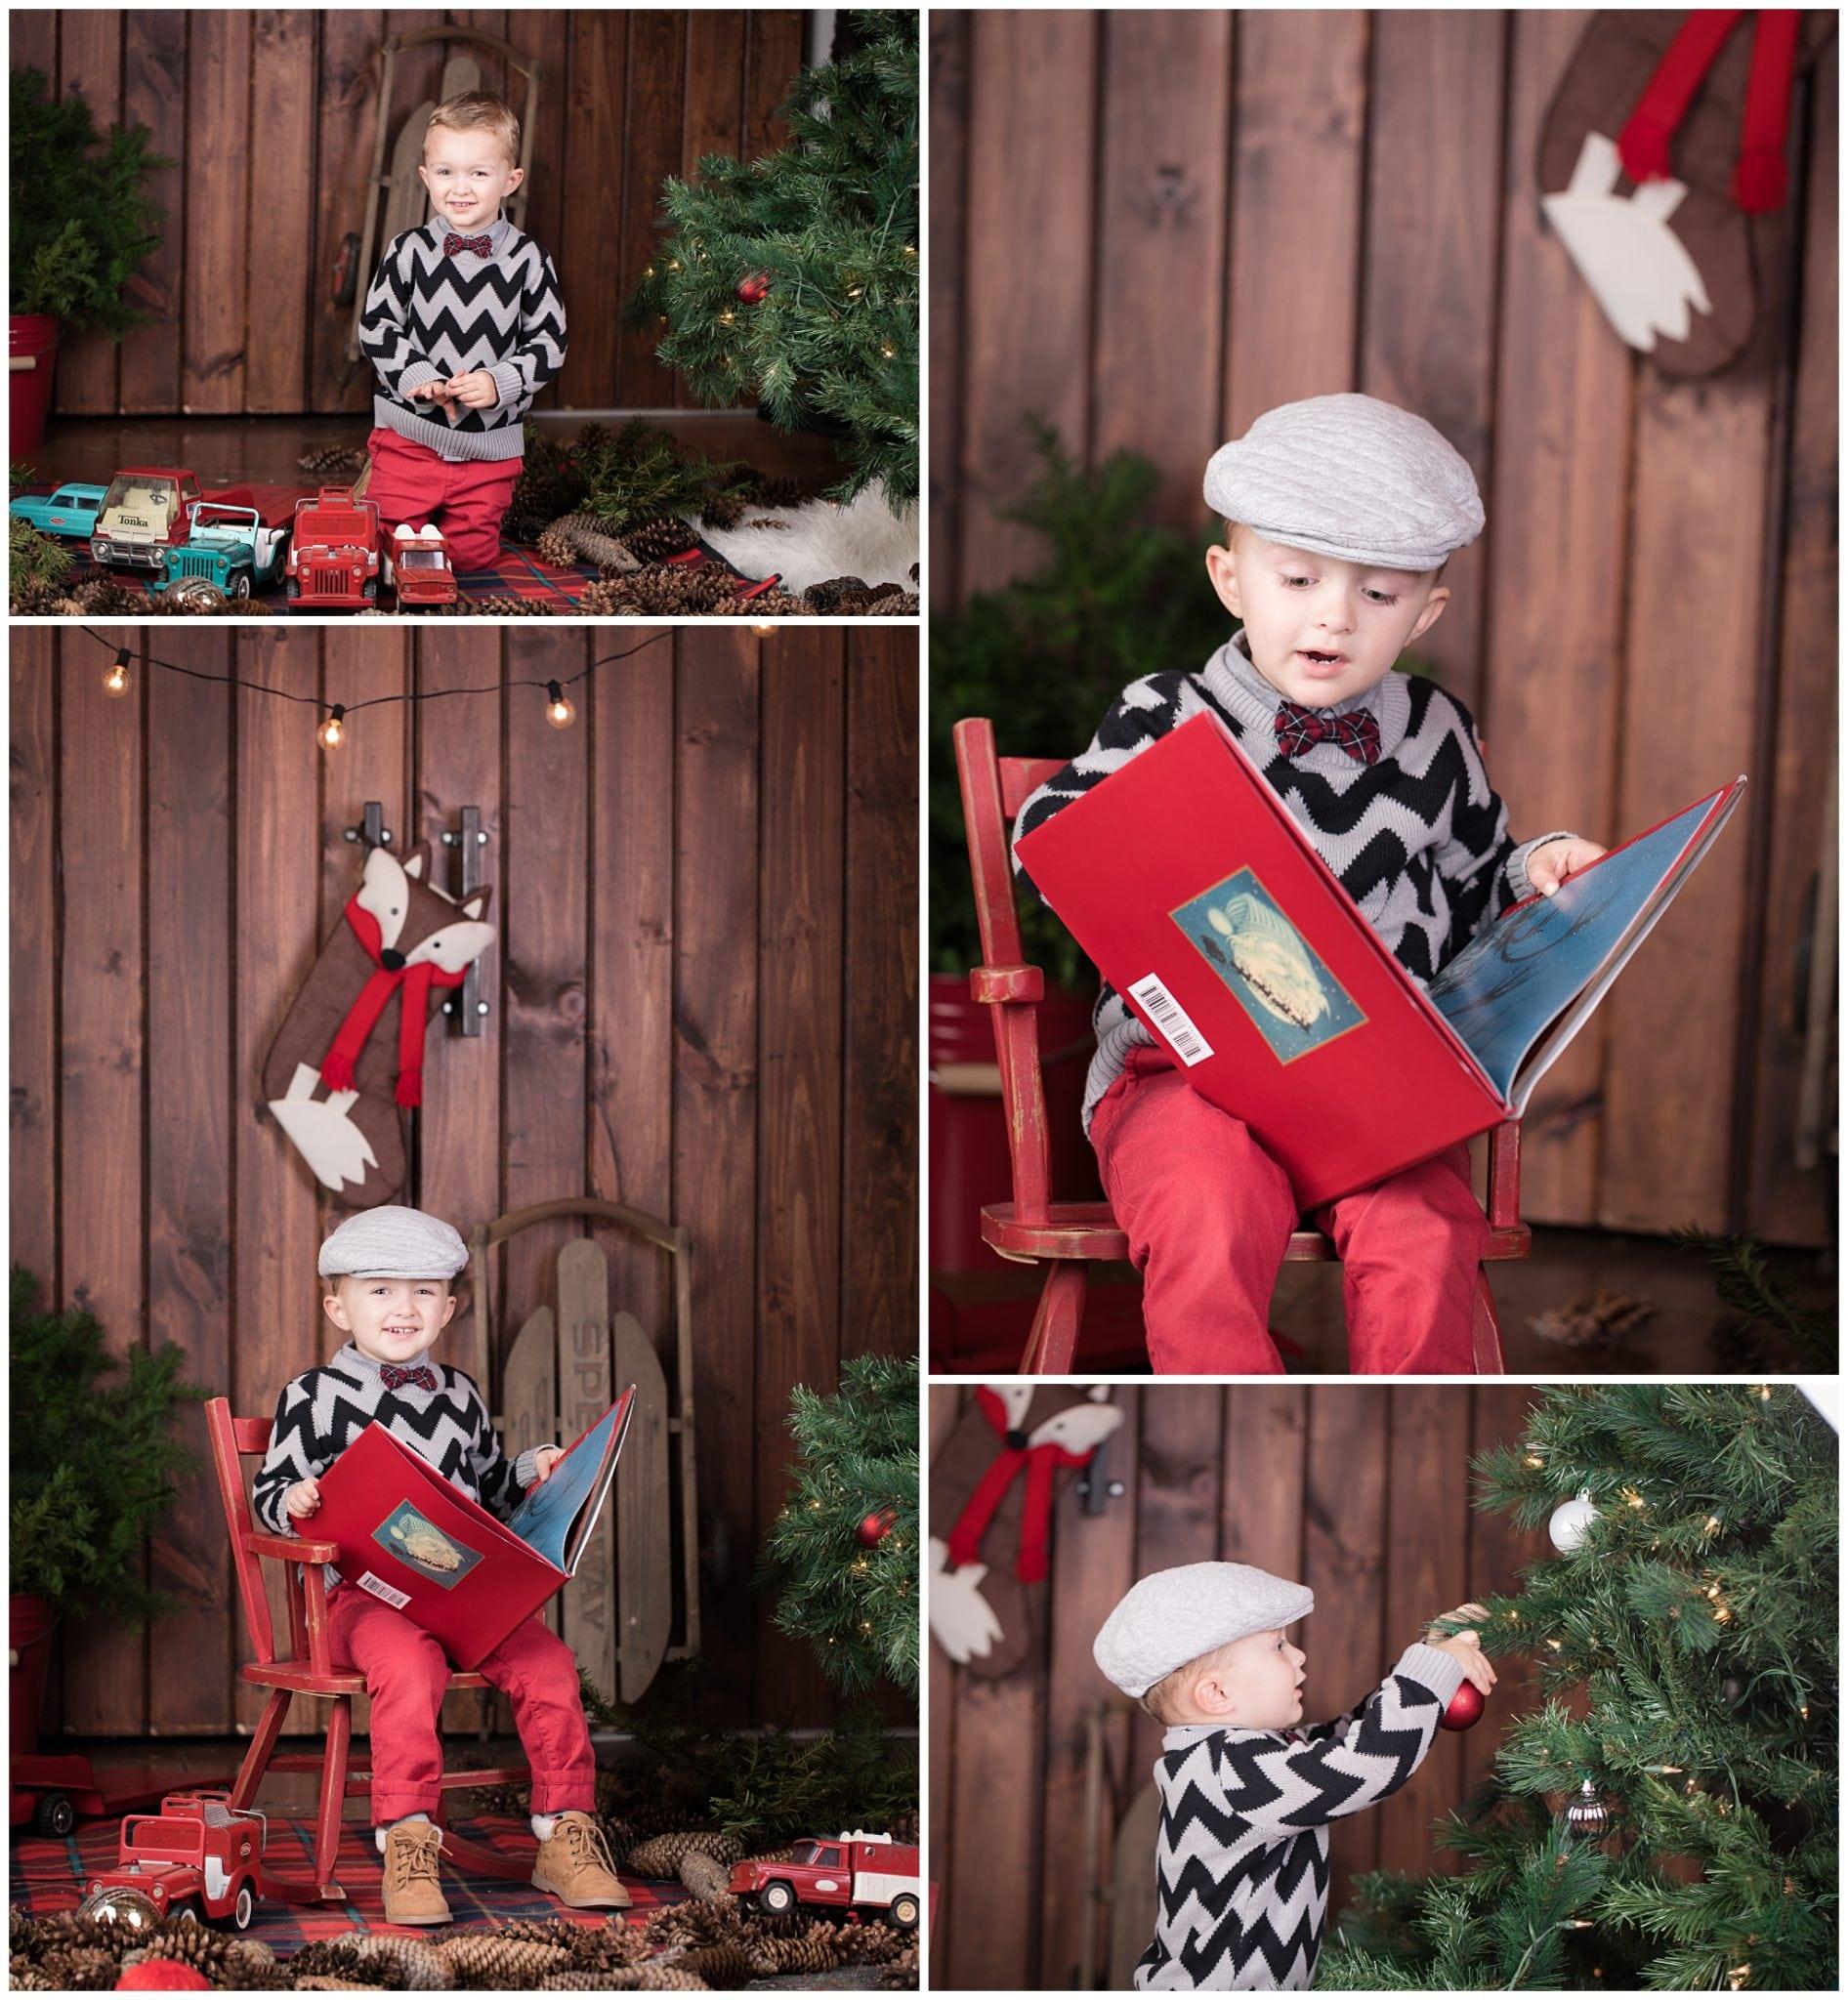 ChristmasMiniSessions_family-baby-kids_Berks-County-Reading-PA_0026.jpg